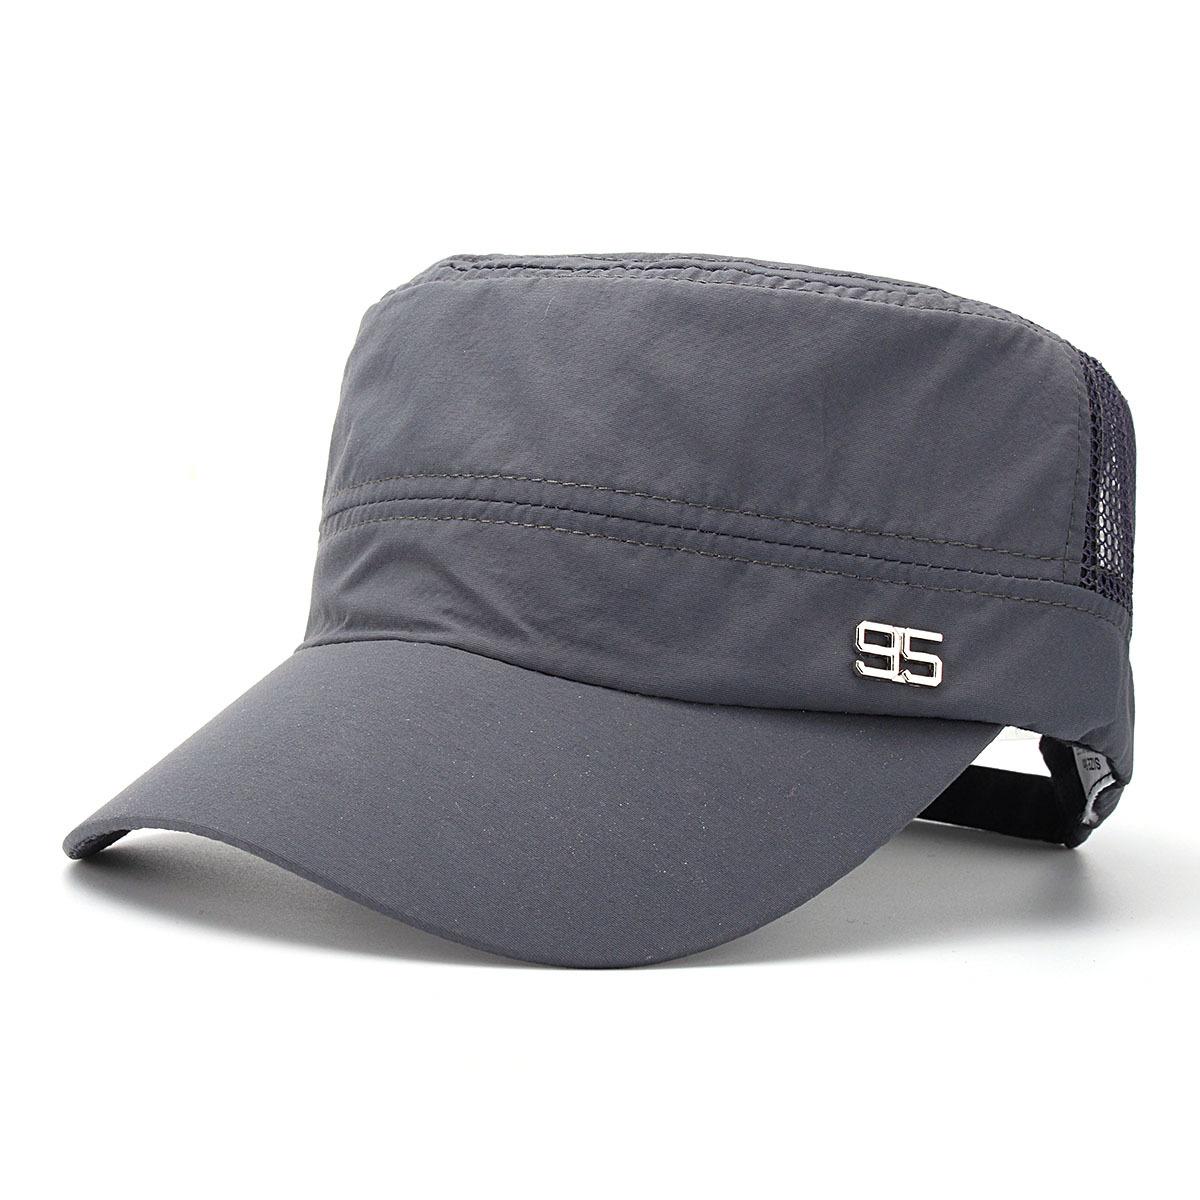 Diskon Produk Pria Wanita Army Plain Hat Kerai Militer Mesh Cadet Outdoor Baseball Topi Datar Intl